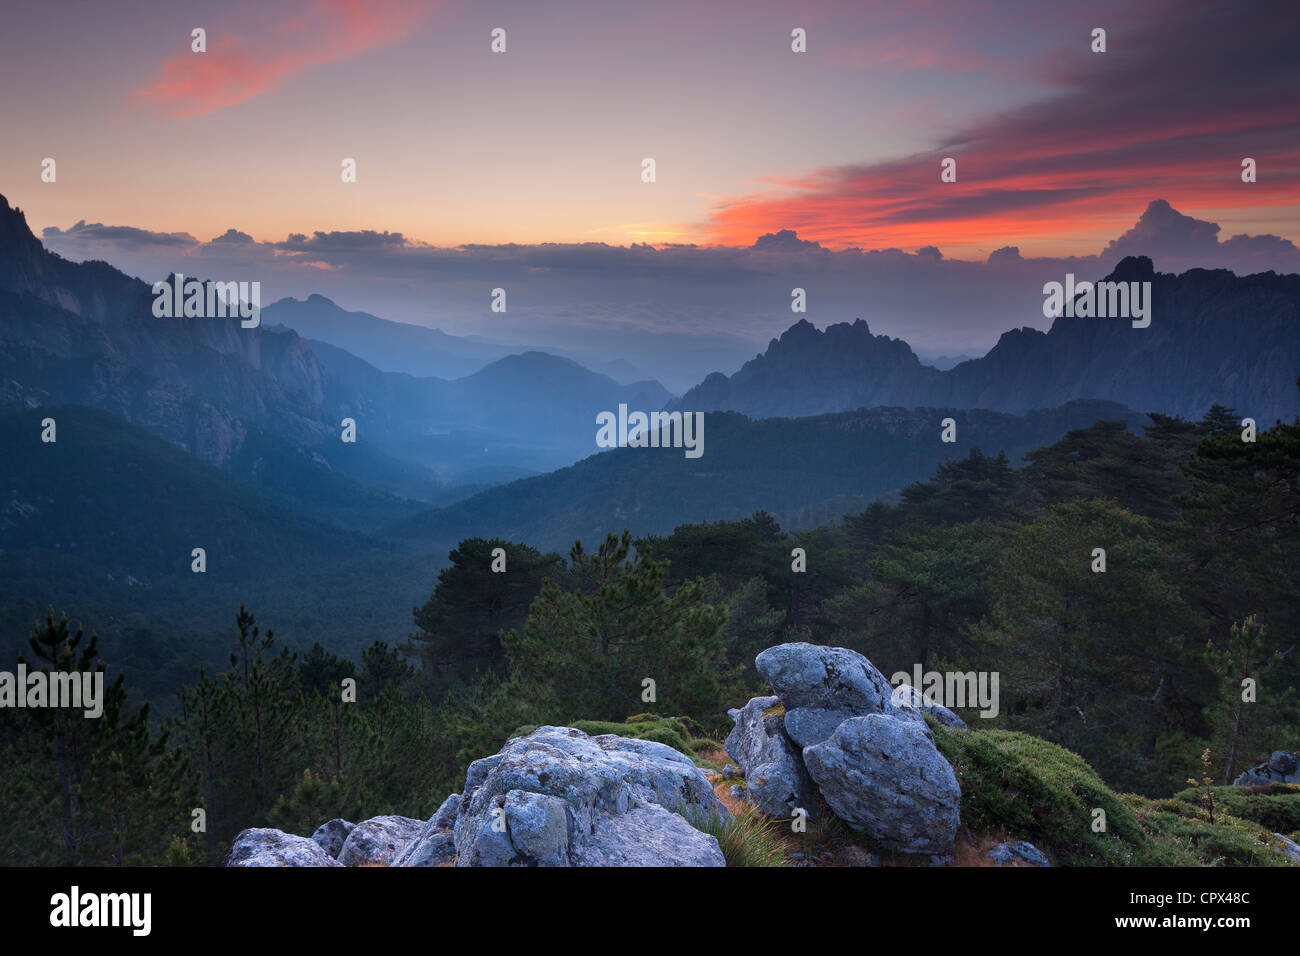 der Col de Bavella bei Dämmerung, Bavella Gebirge, Korsika, Frankreich Stockbild